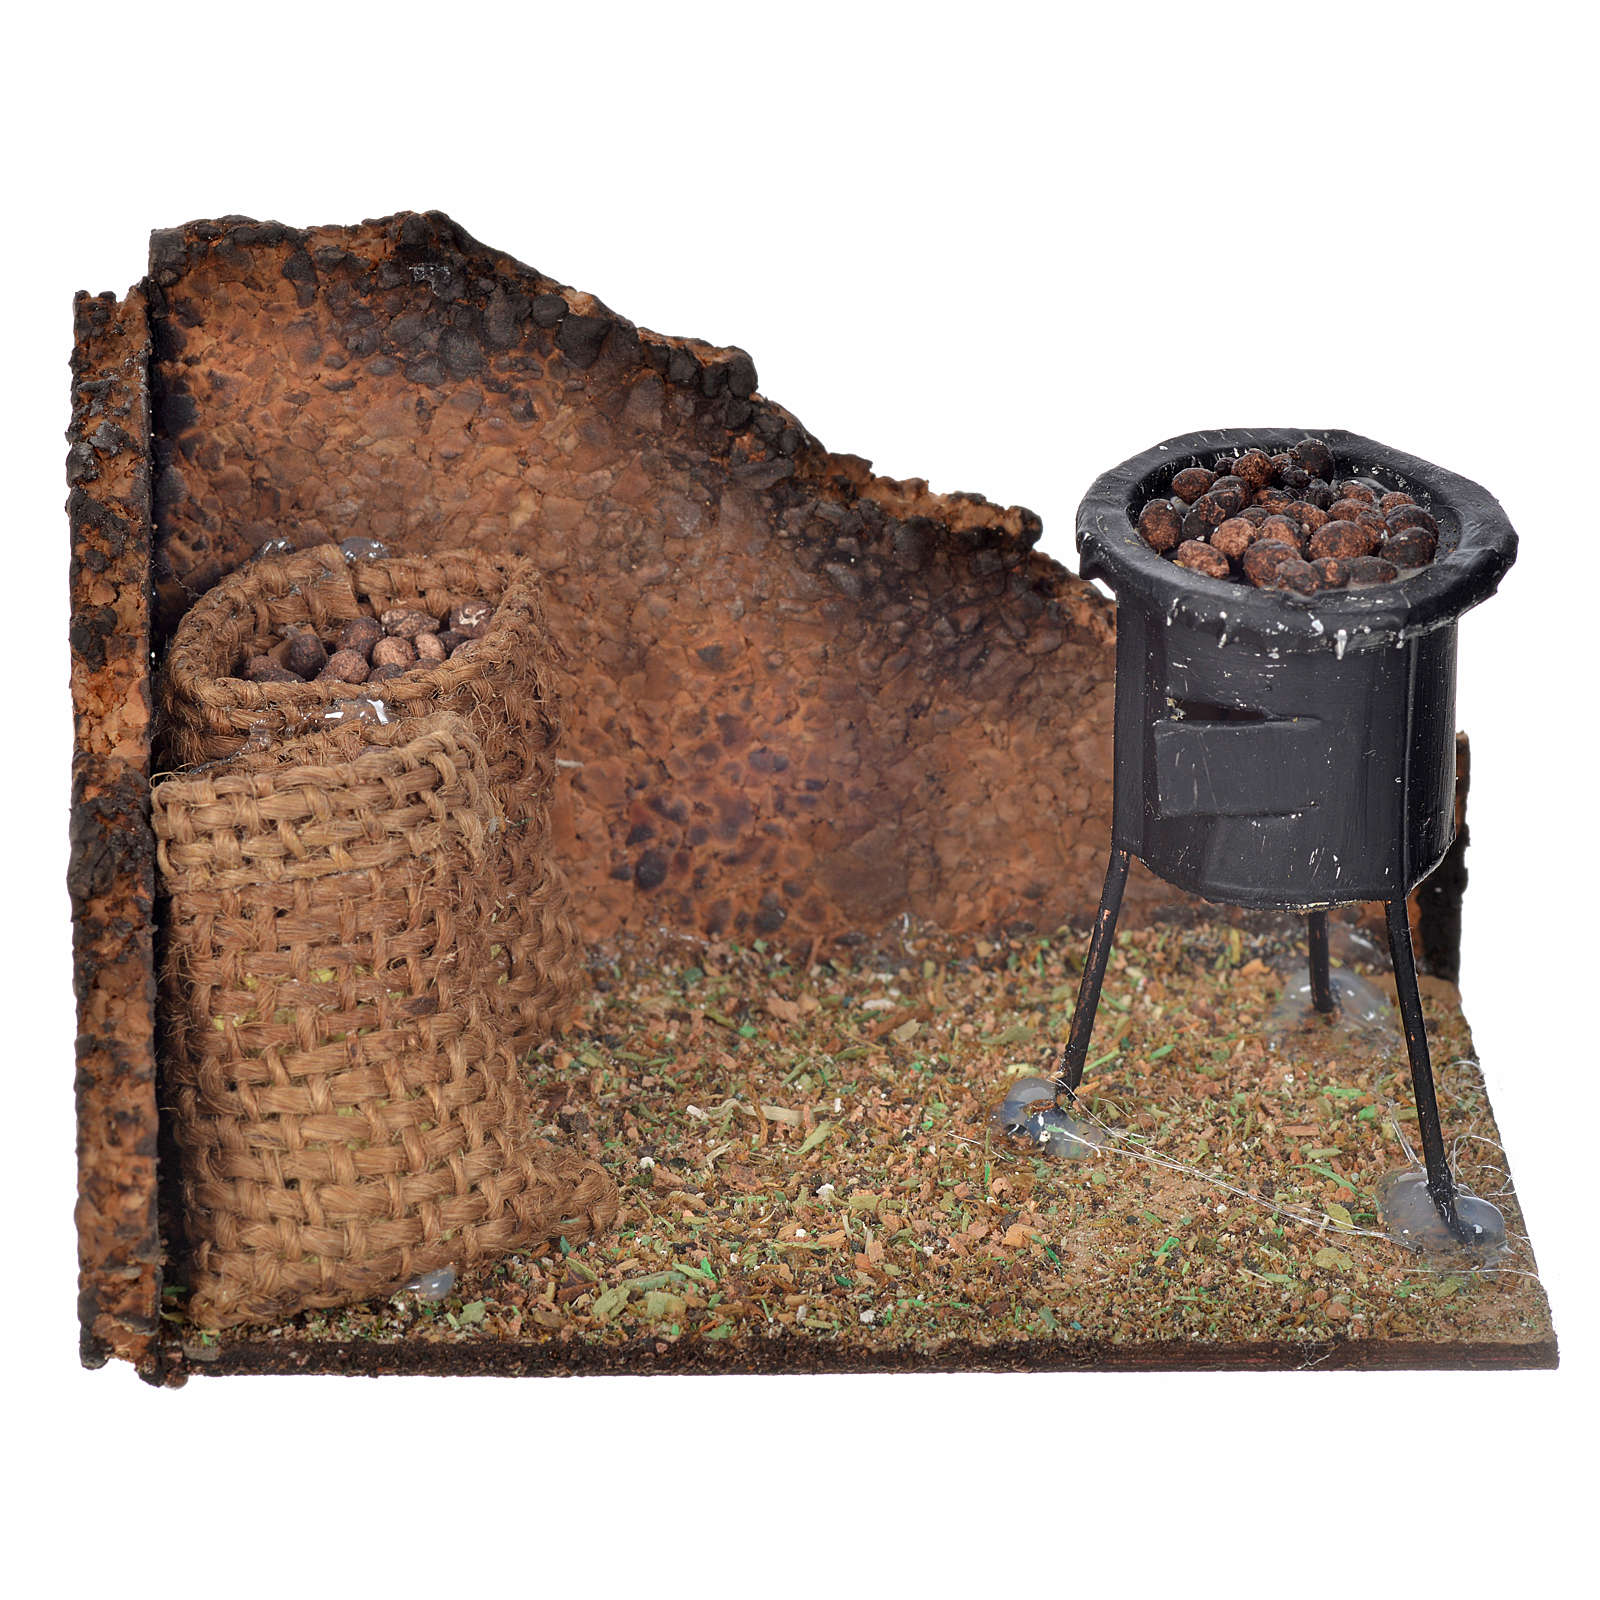 Scena fornace castagne e sacco 6x9,5x6 cm presepe napoletano 4